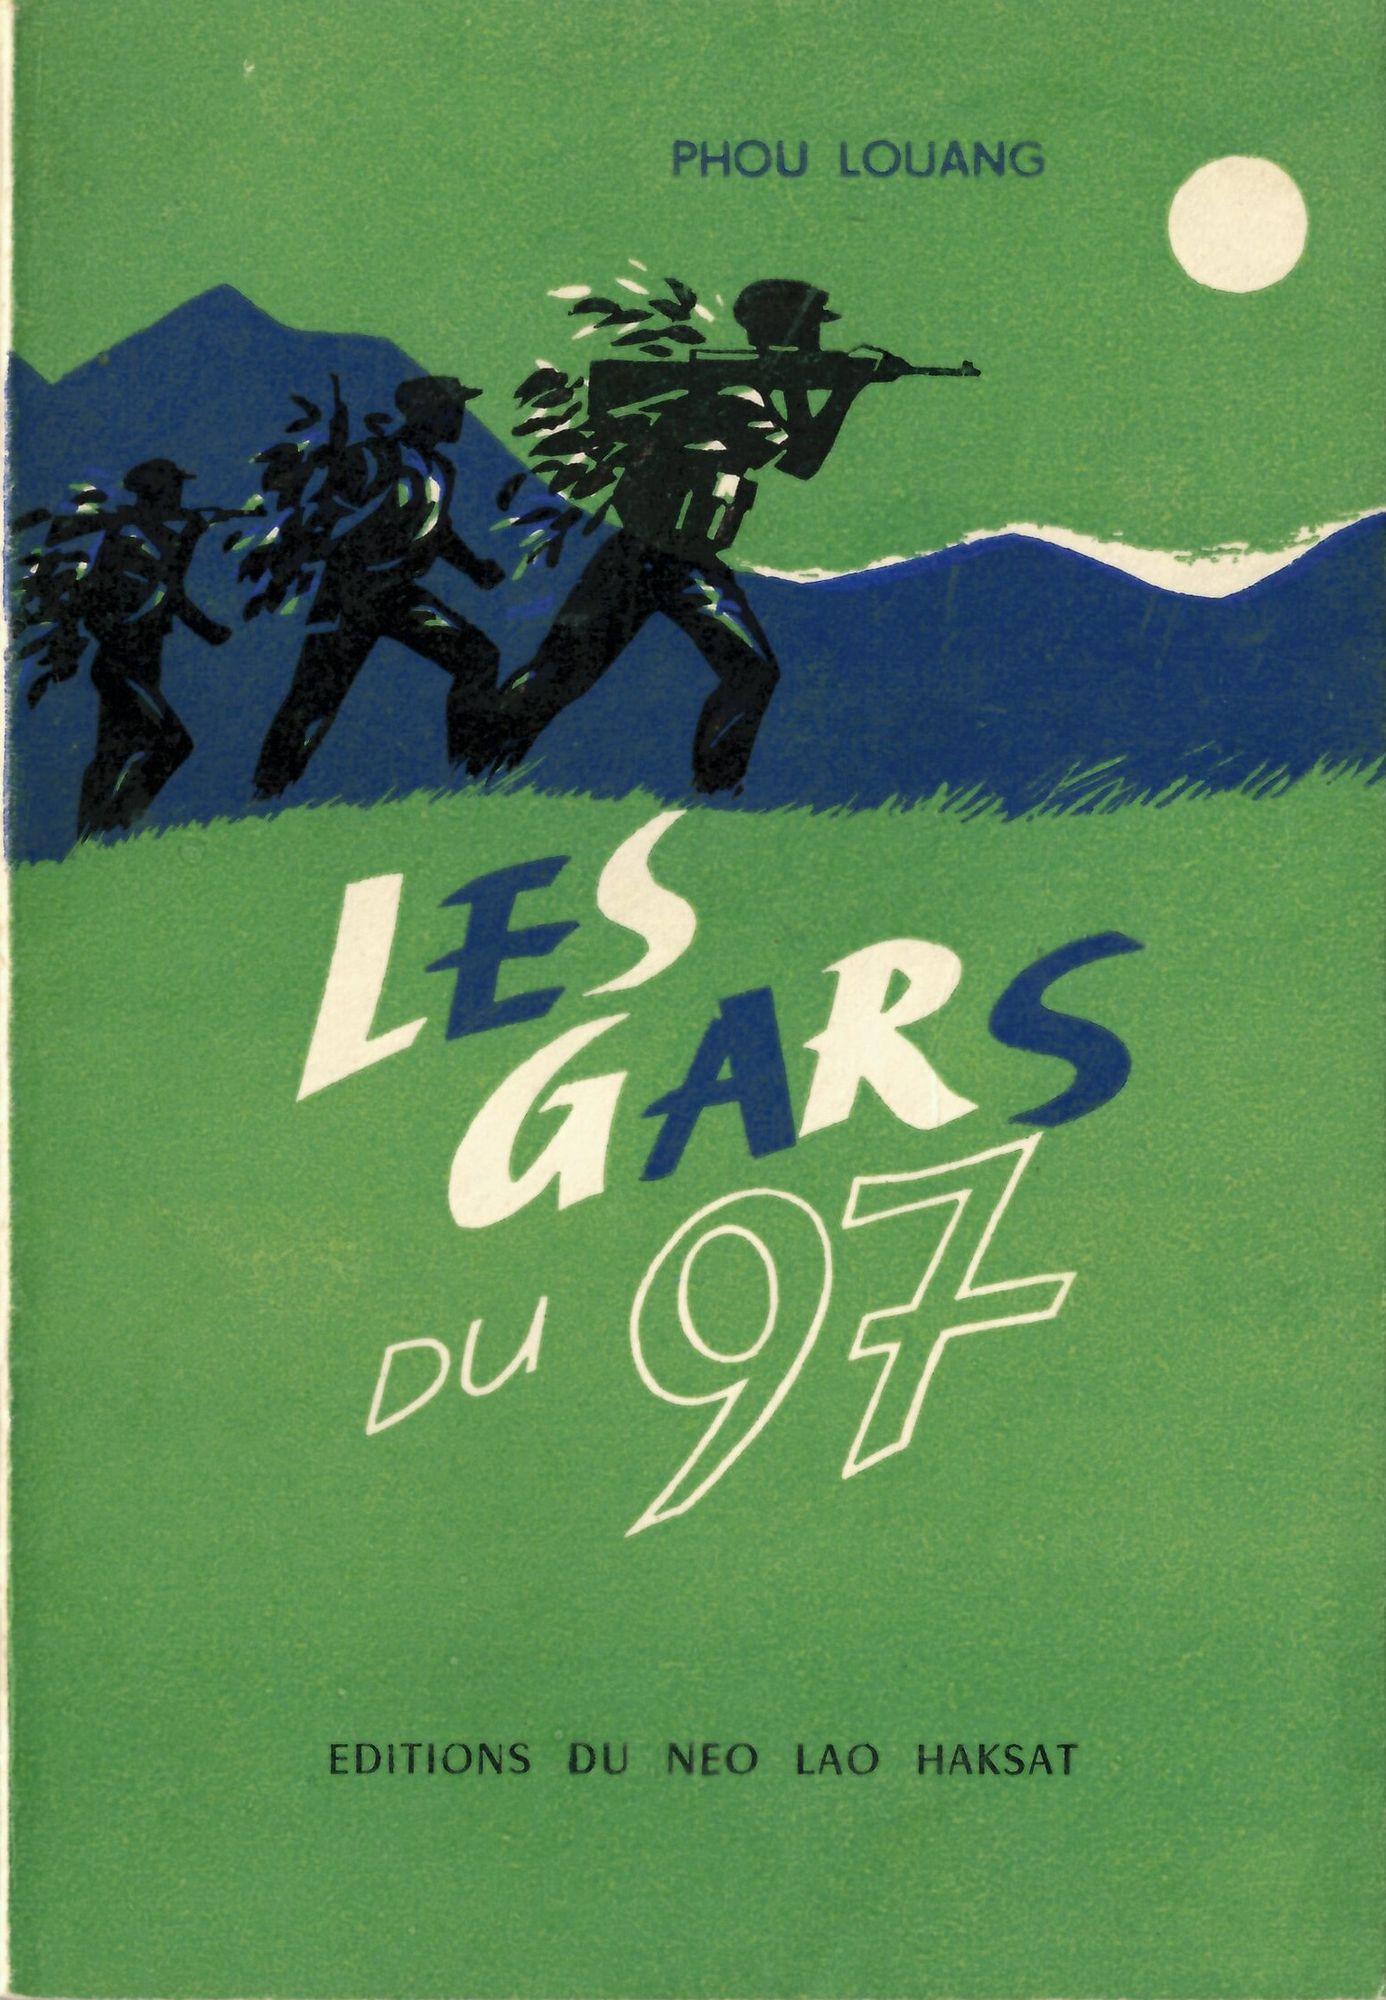 Laos and the Vietnam War - Asian and African studies blog